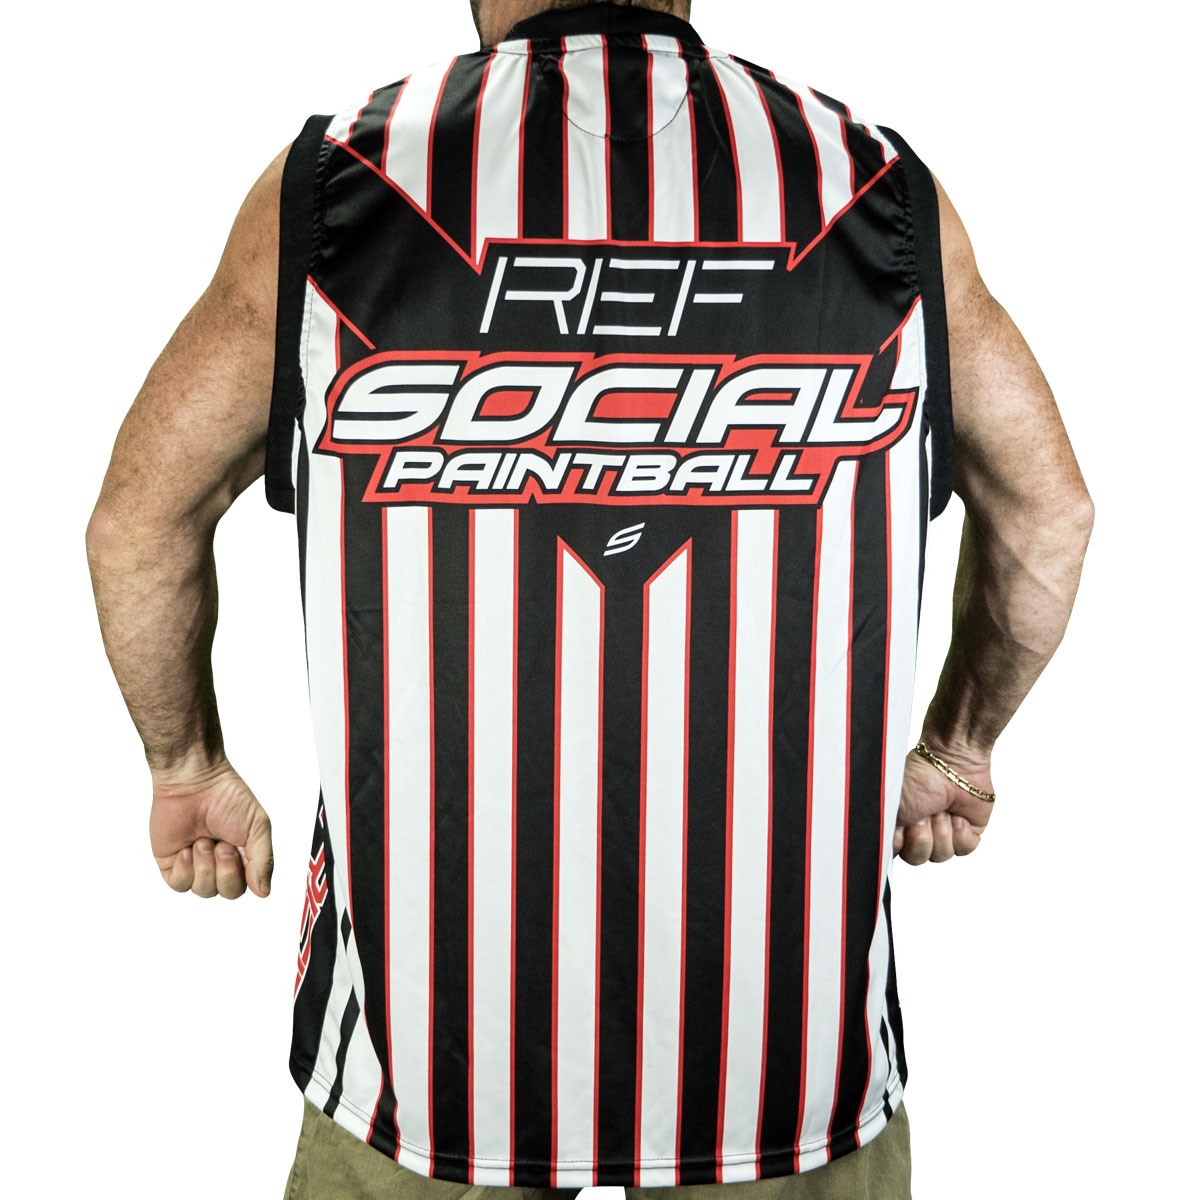 4884b8678 Grit Sleeveless Jersey, Field Ref - Social Paintball